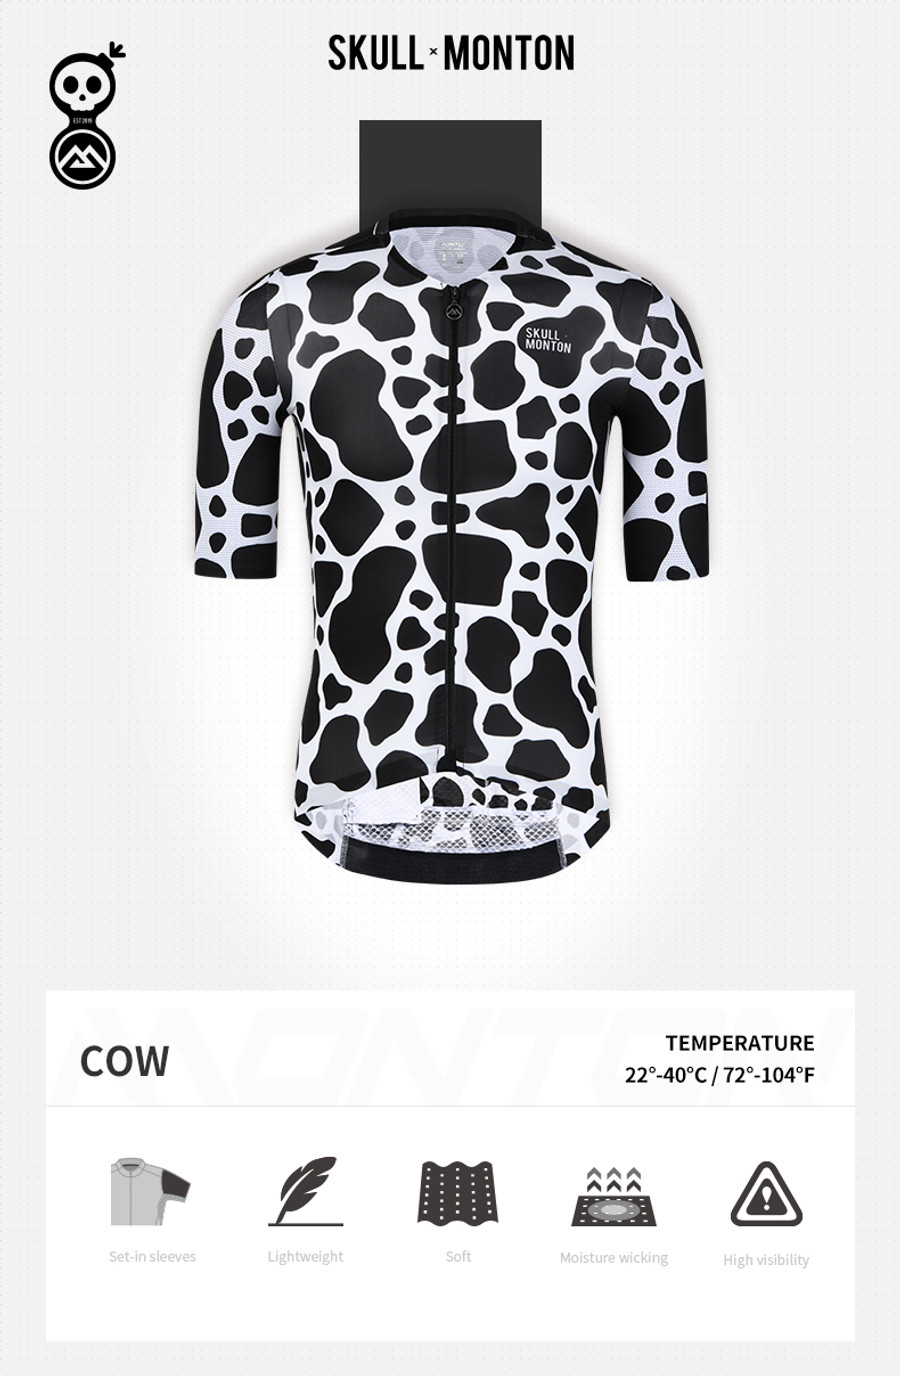 Men's Urban+ COW Jersey